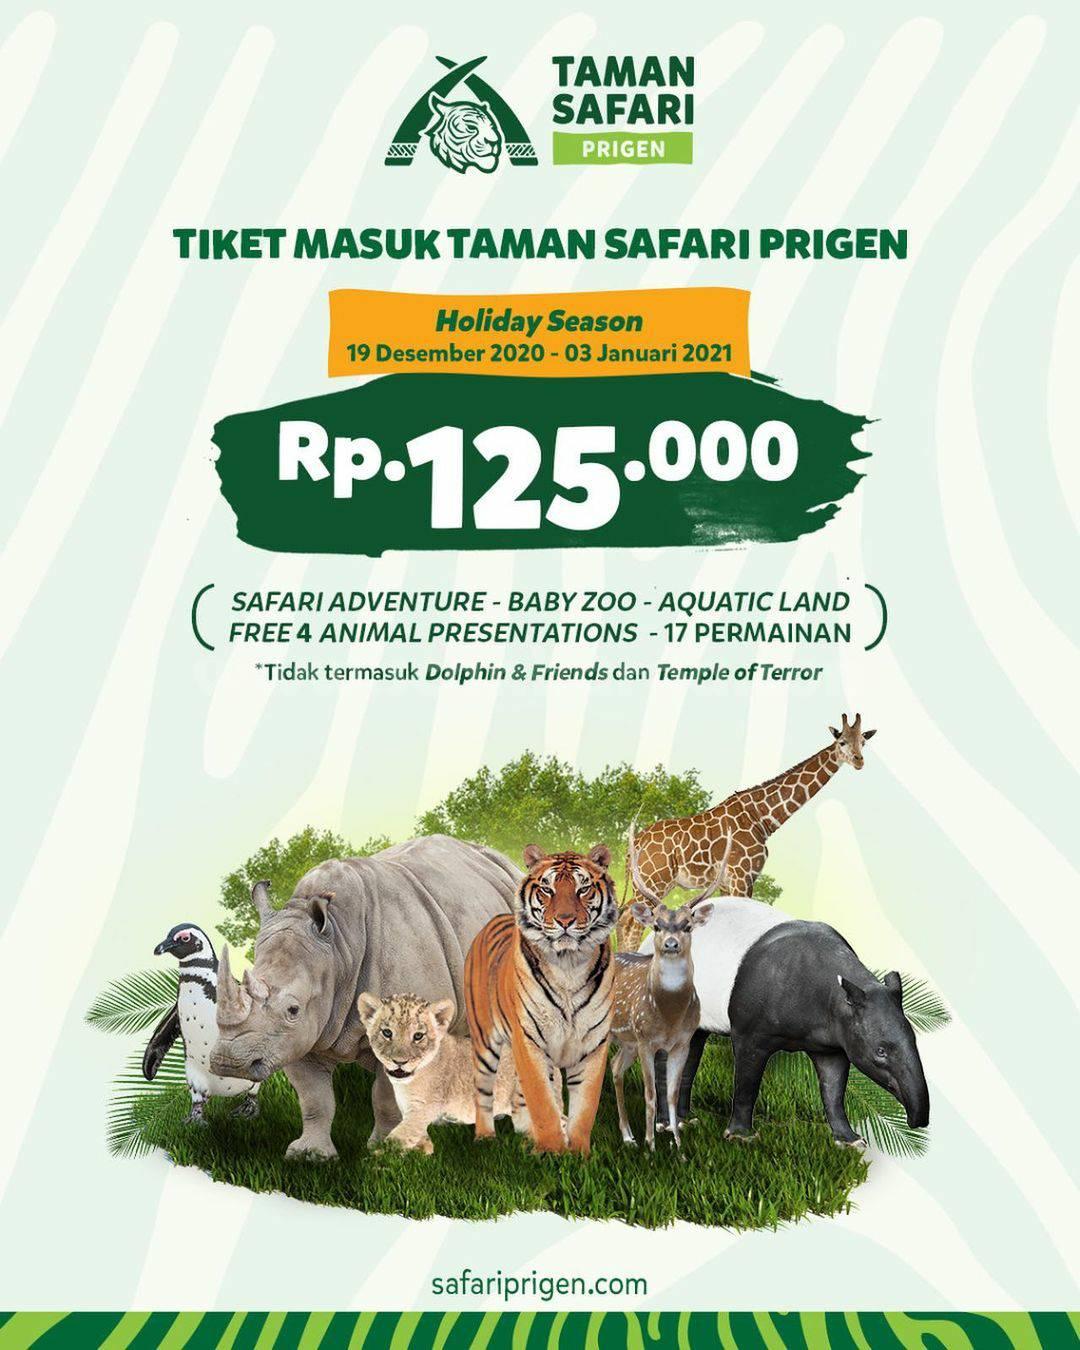 Taman Safari Prigen Holiday Season – Promo Spesial Harga Tiket Masuk CUMA Rp 125.000